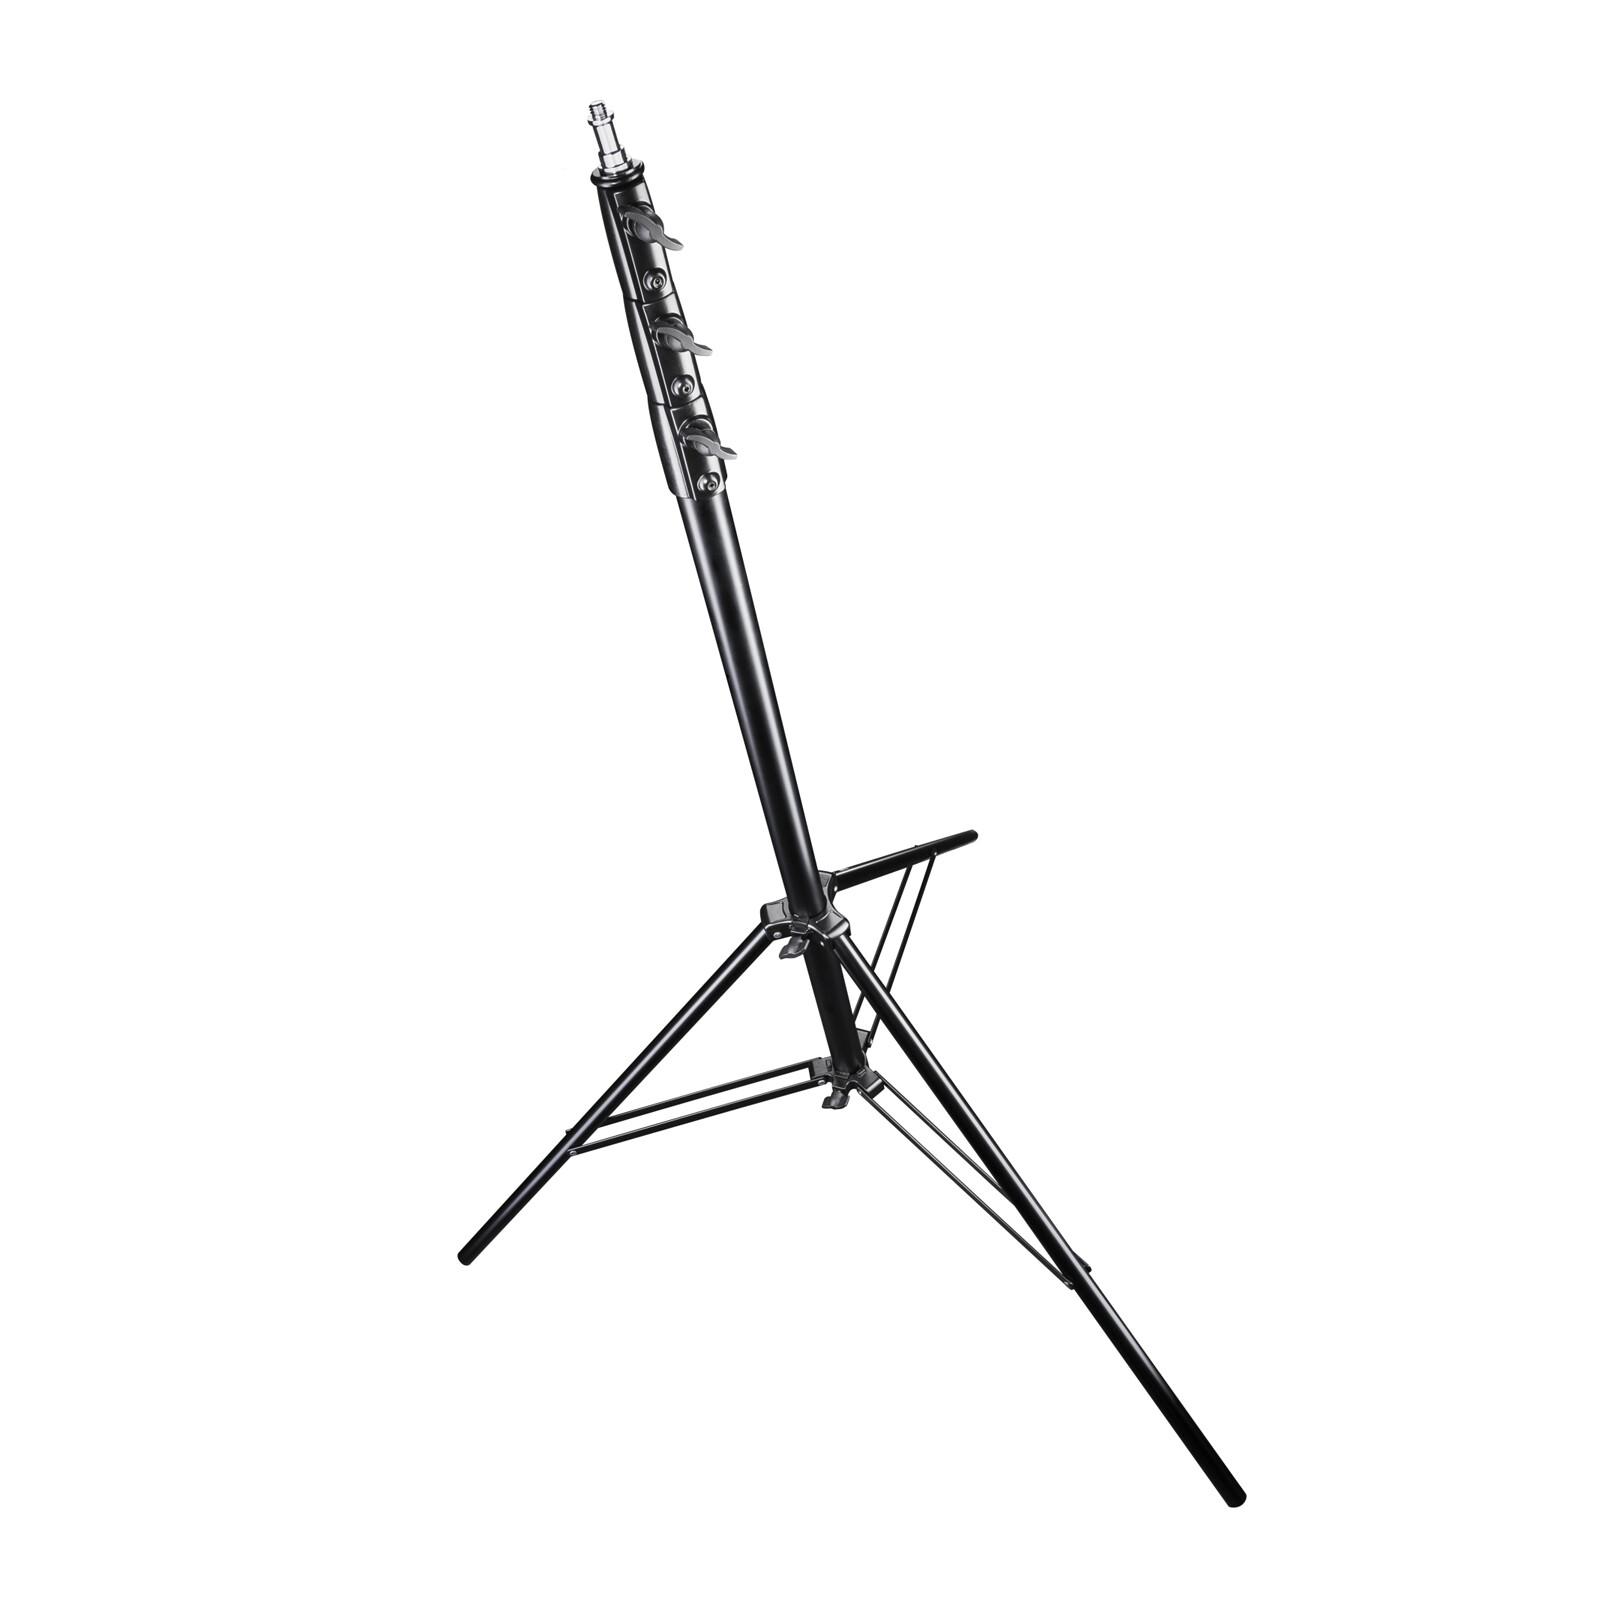 walimex pro Lampenstativ AIR, 355cm